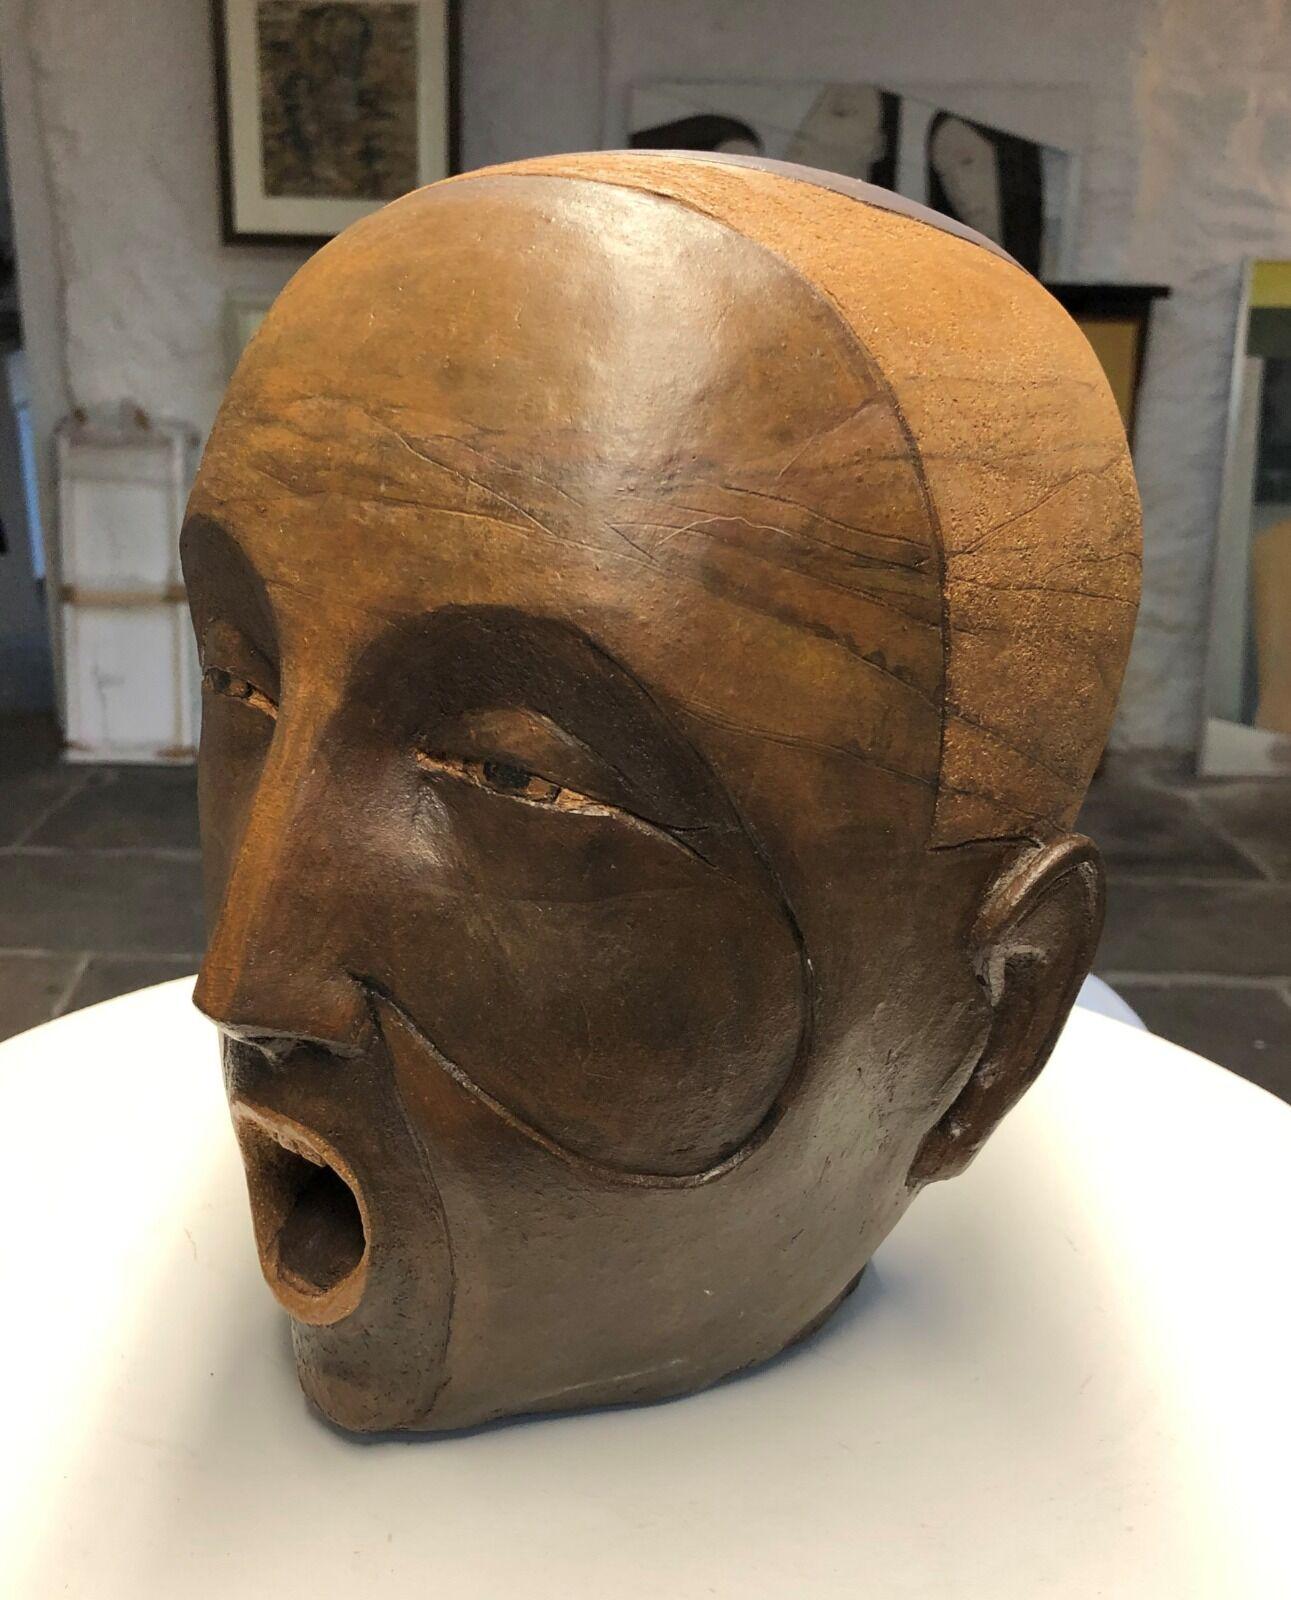 6. Two Tone Head